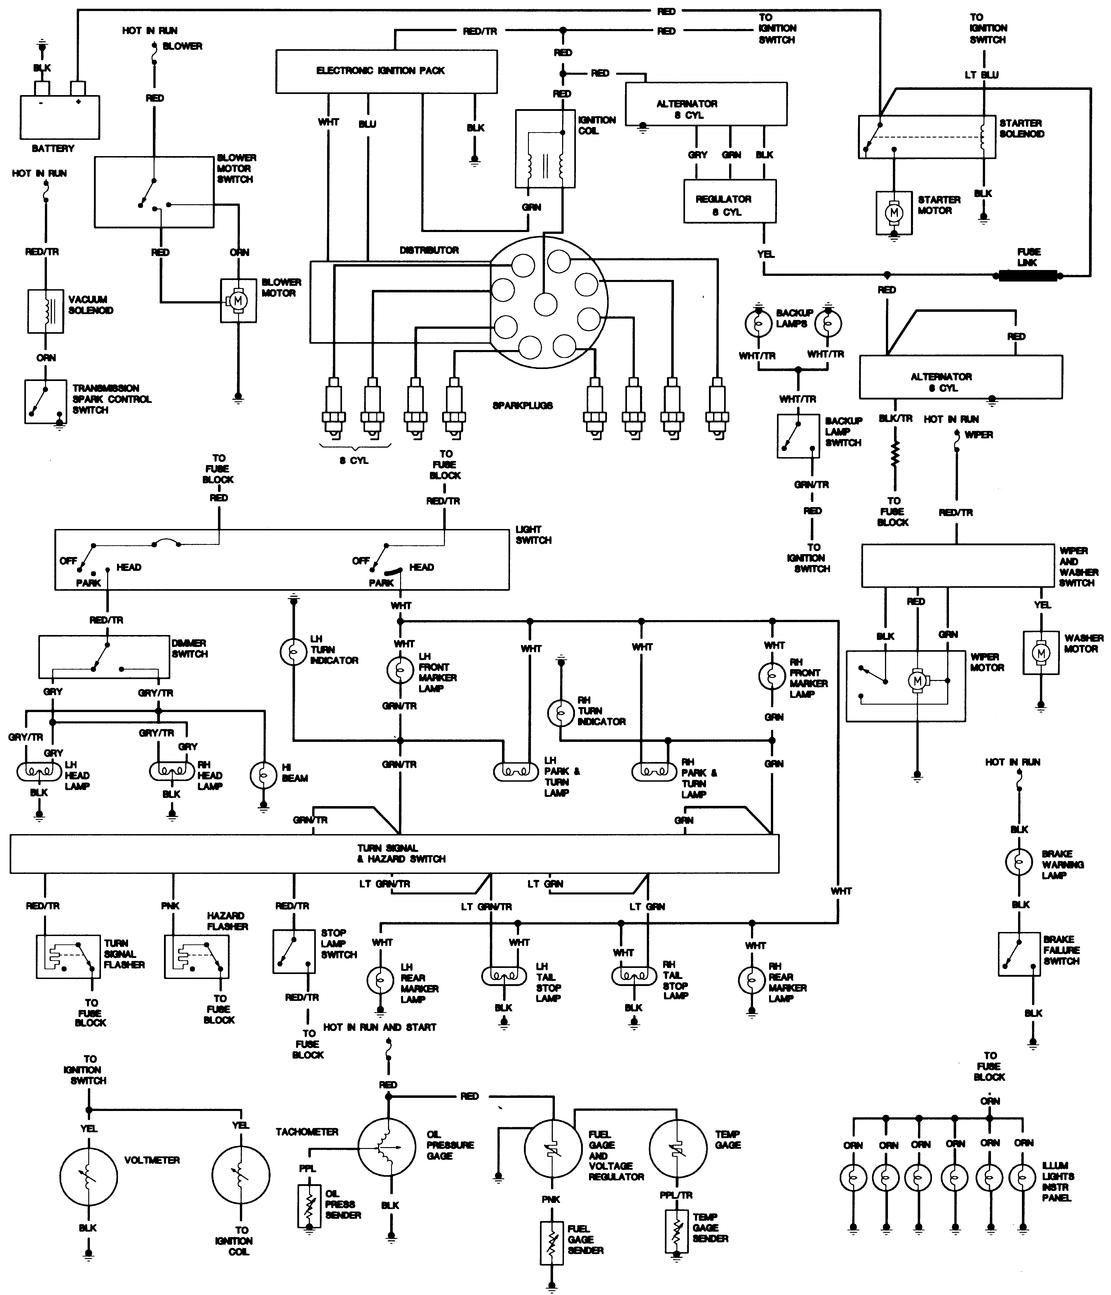 1980 cj5 wiring diagram furthermore jeep cj7 tachometer wiring wiring diagram